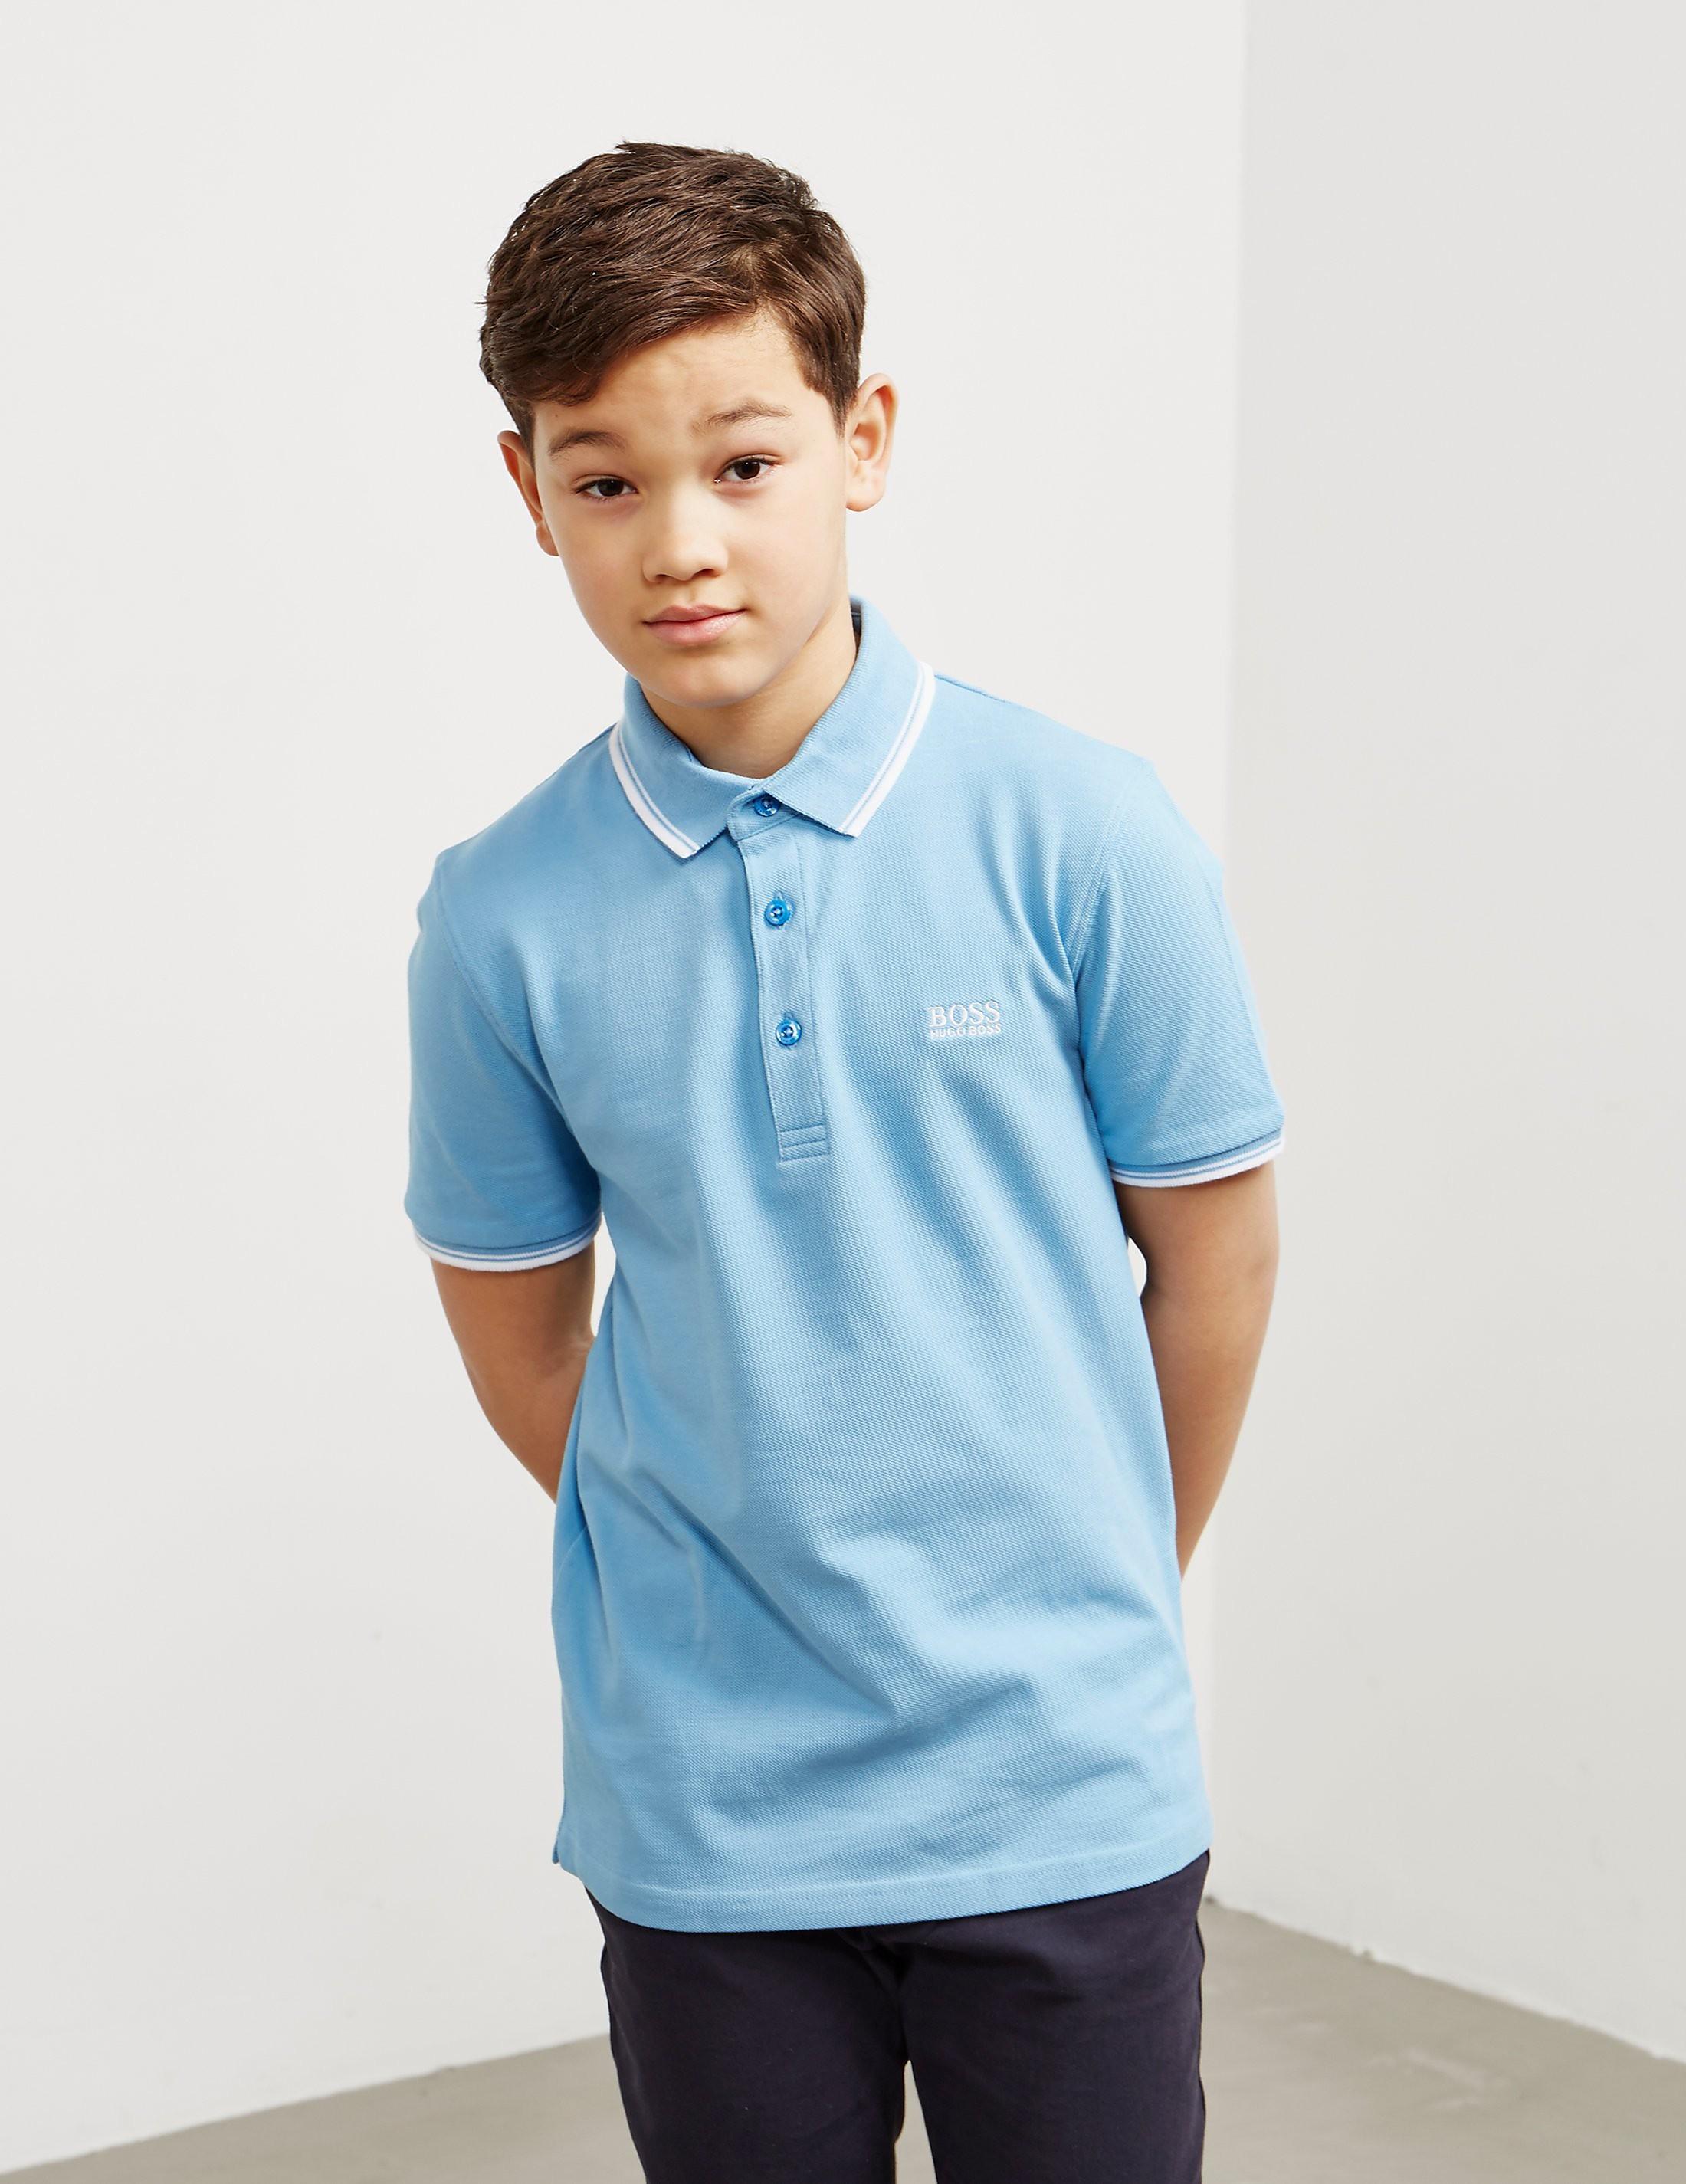 BOSS Tipped Short Sleeve Polo Shirt